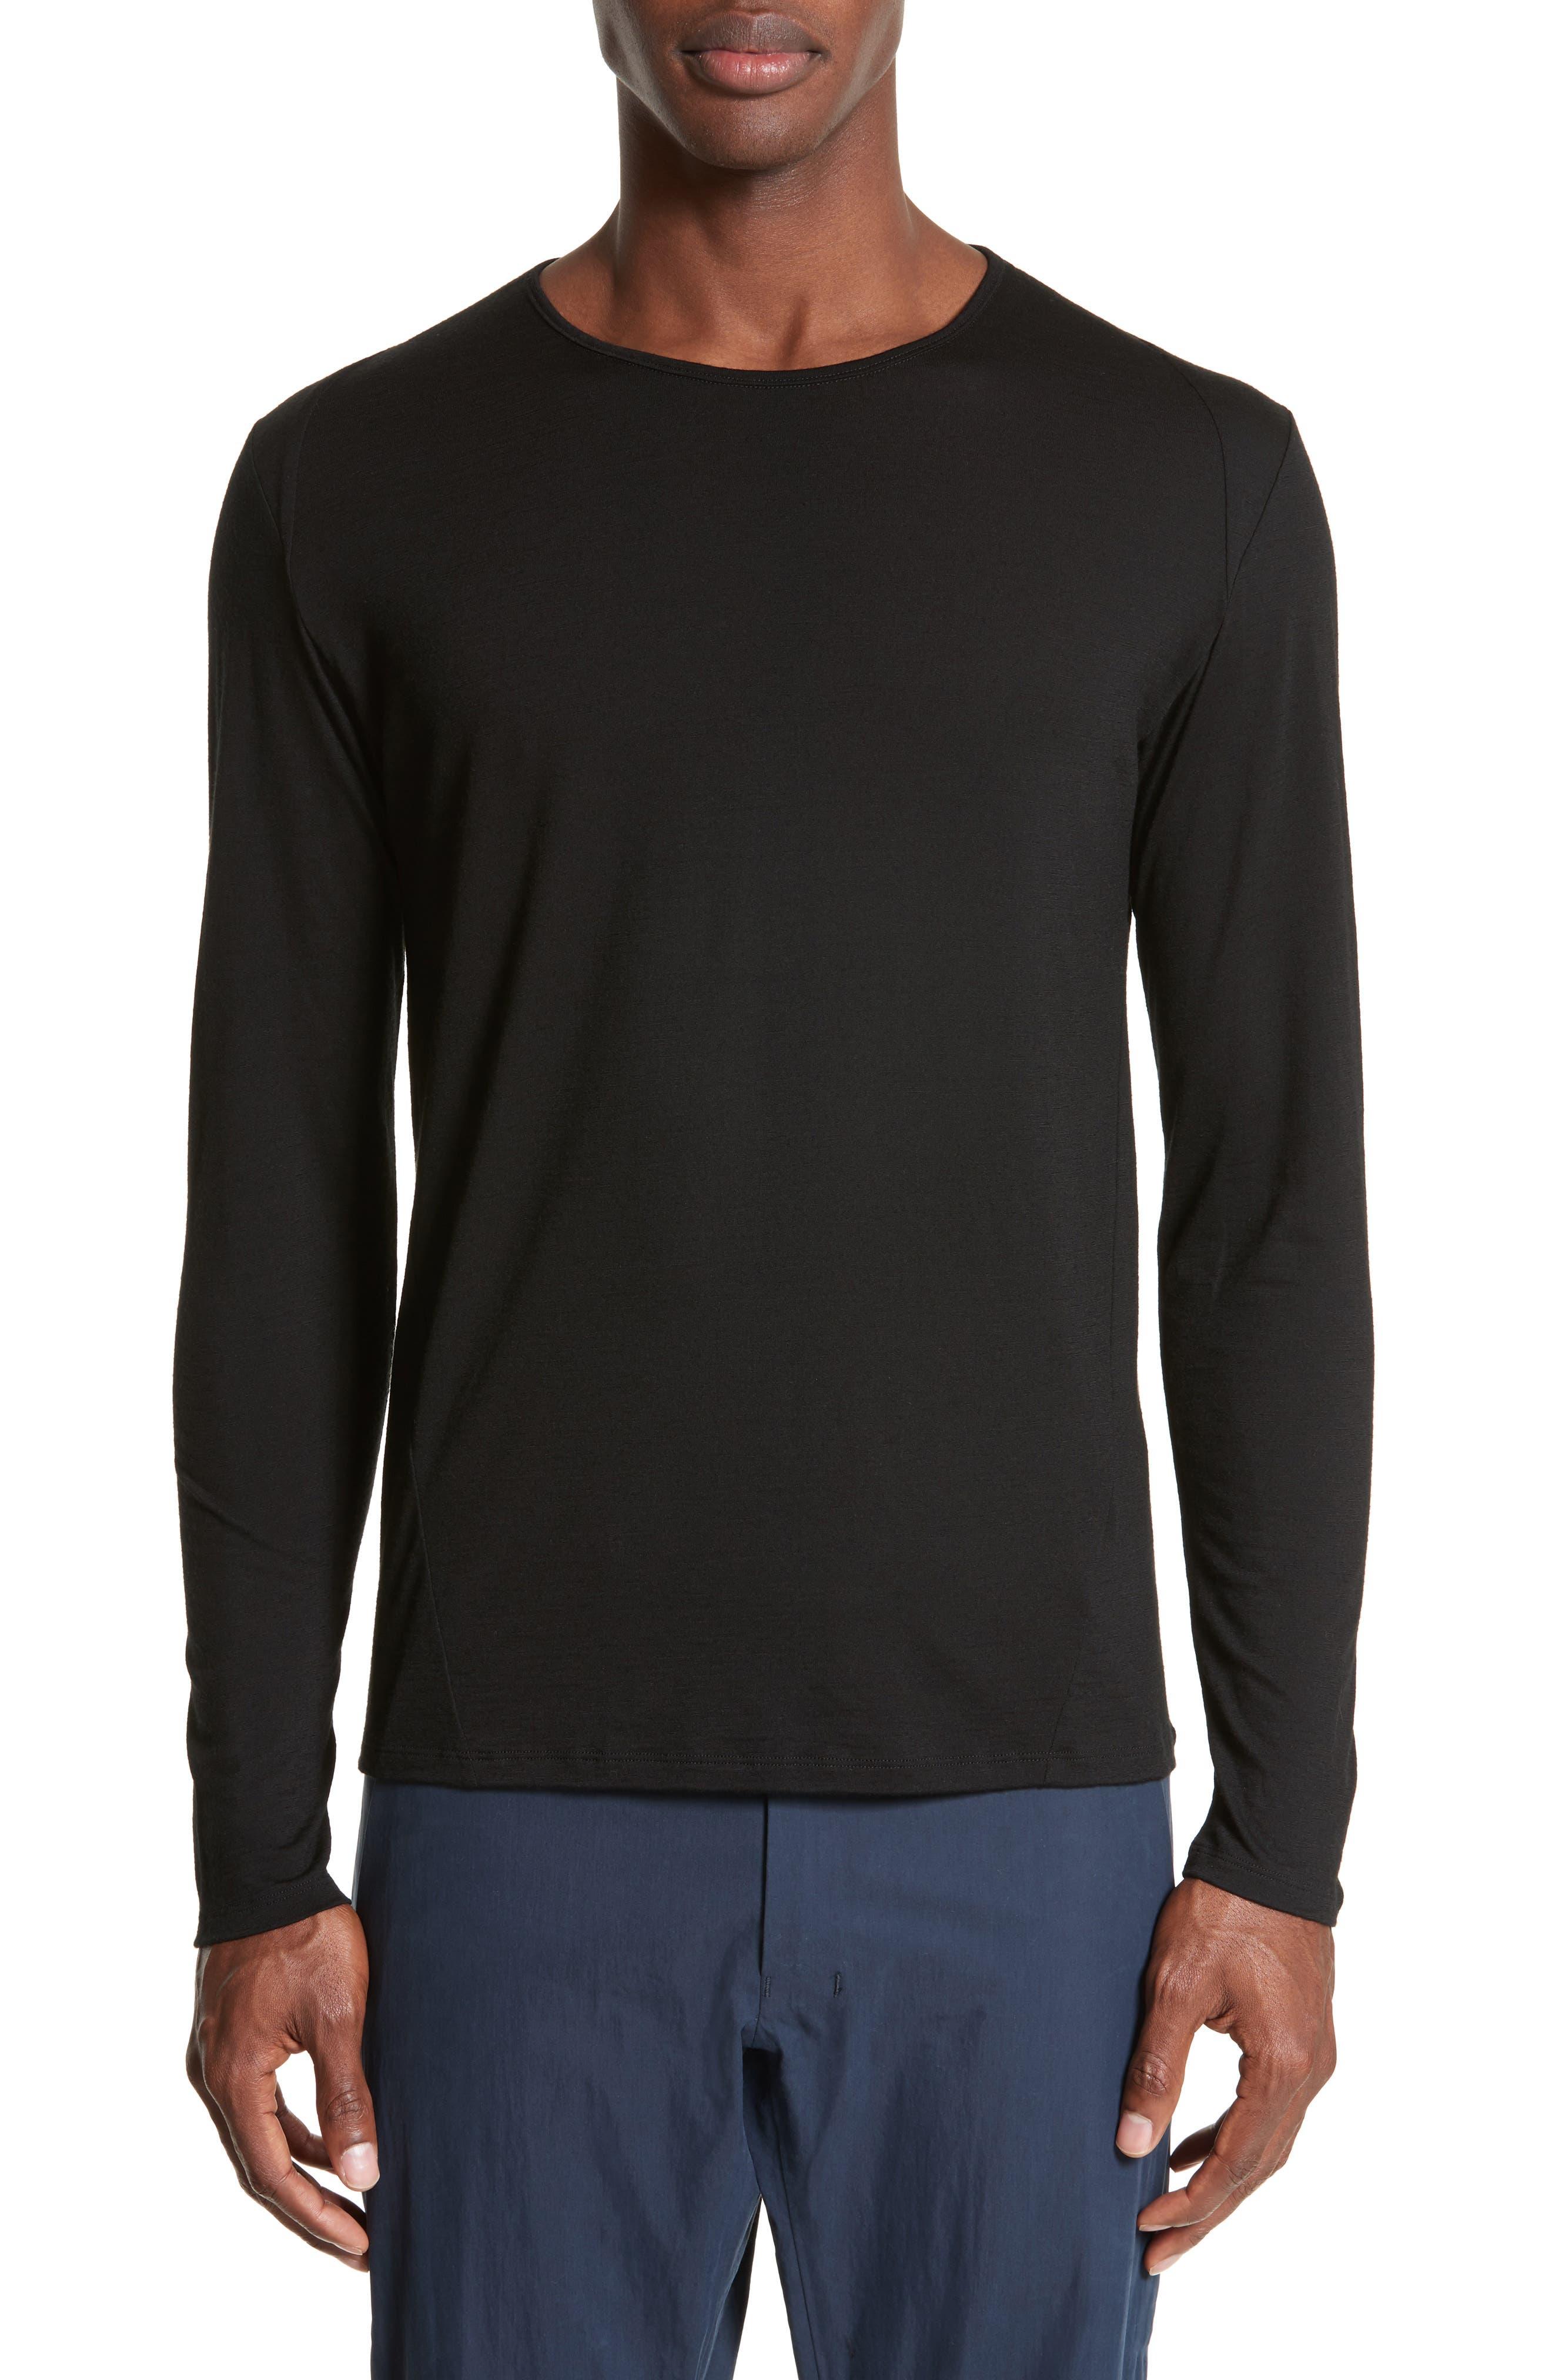 Main Image - Arc'teryx Veilance Frame Merino Wool T-Shirt